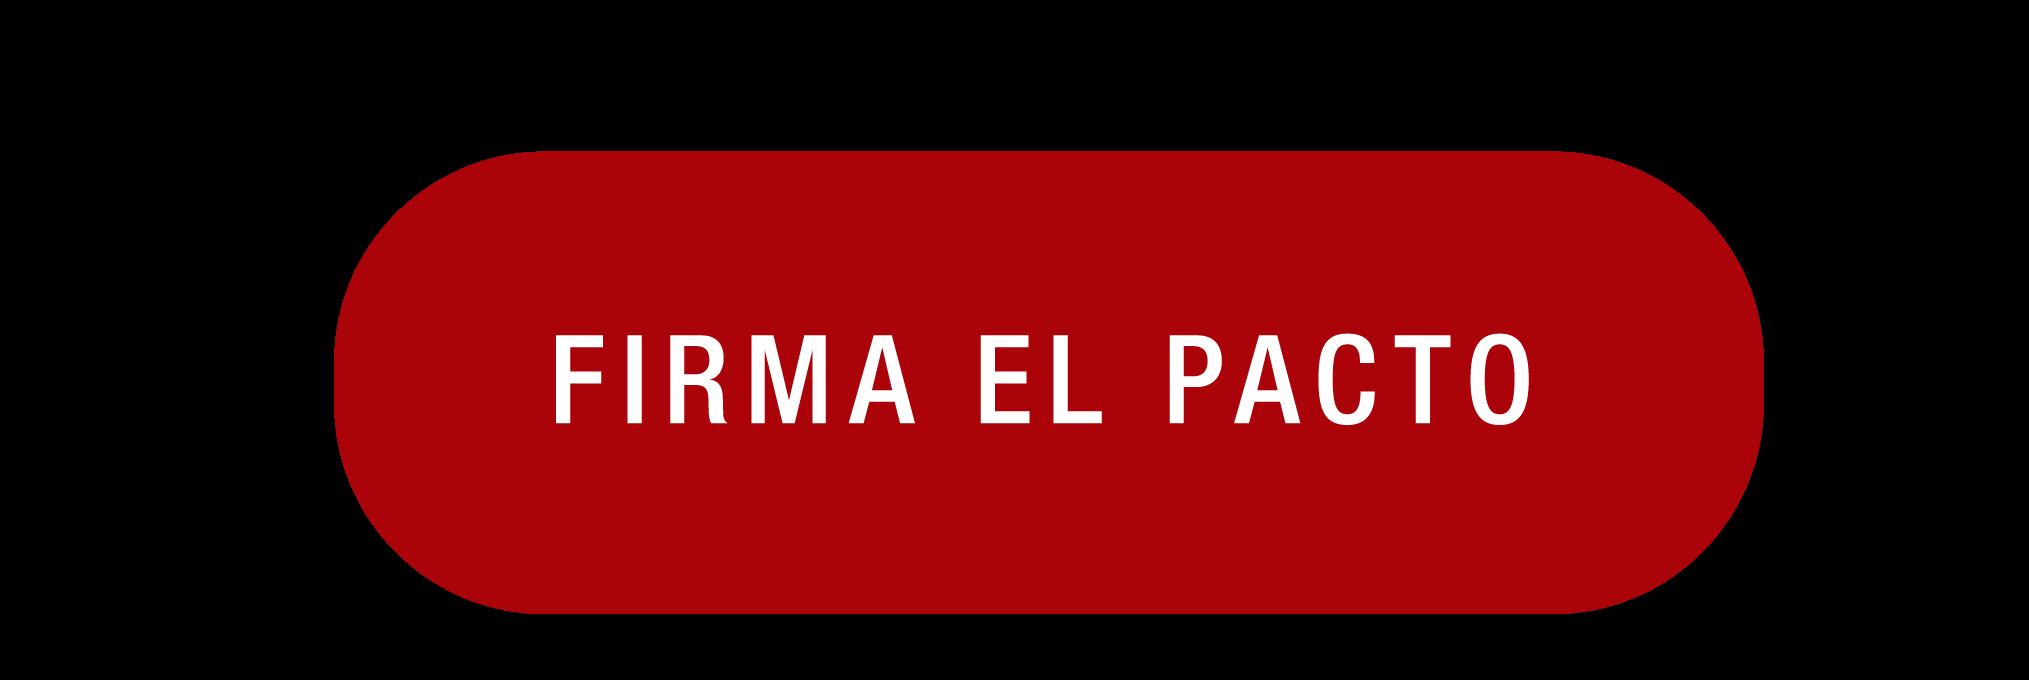 FirmaPacto